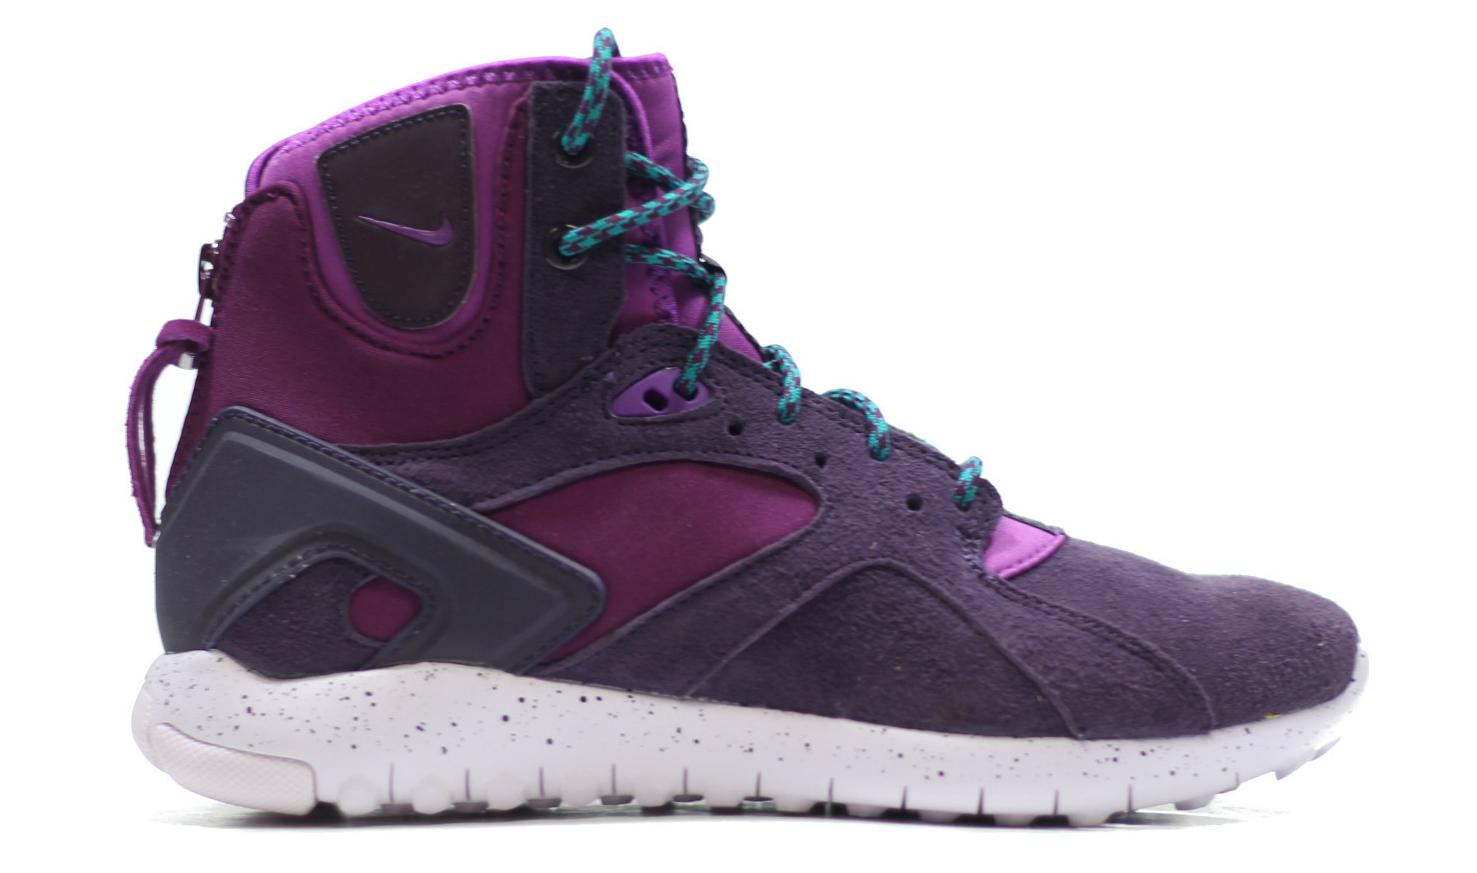 c2f109e2f4b01 Nike WMNS Mobb Mid Color  Mulberry Purple Dusk Style    749532-555. Price    120